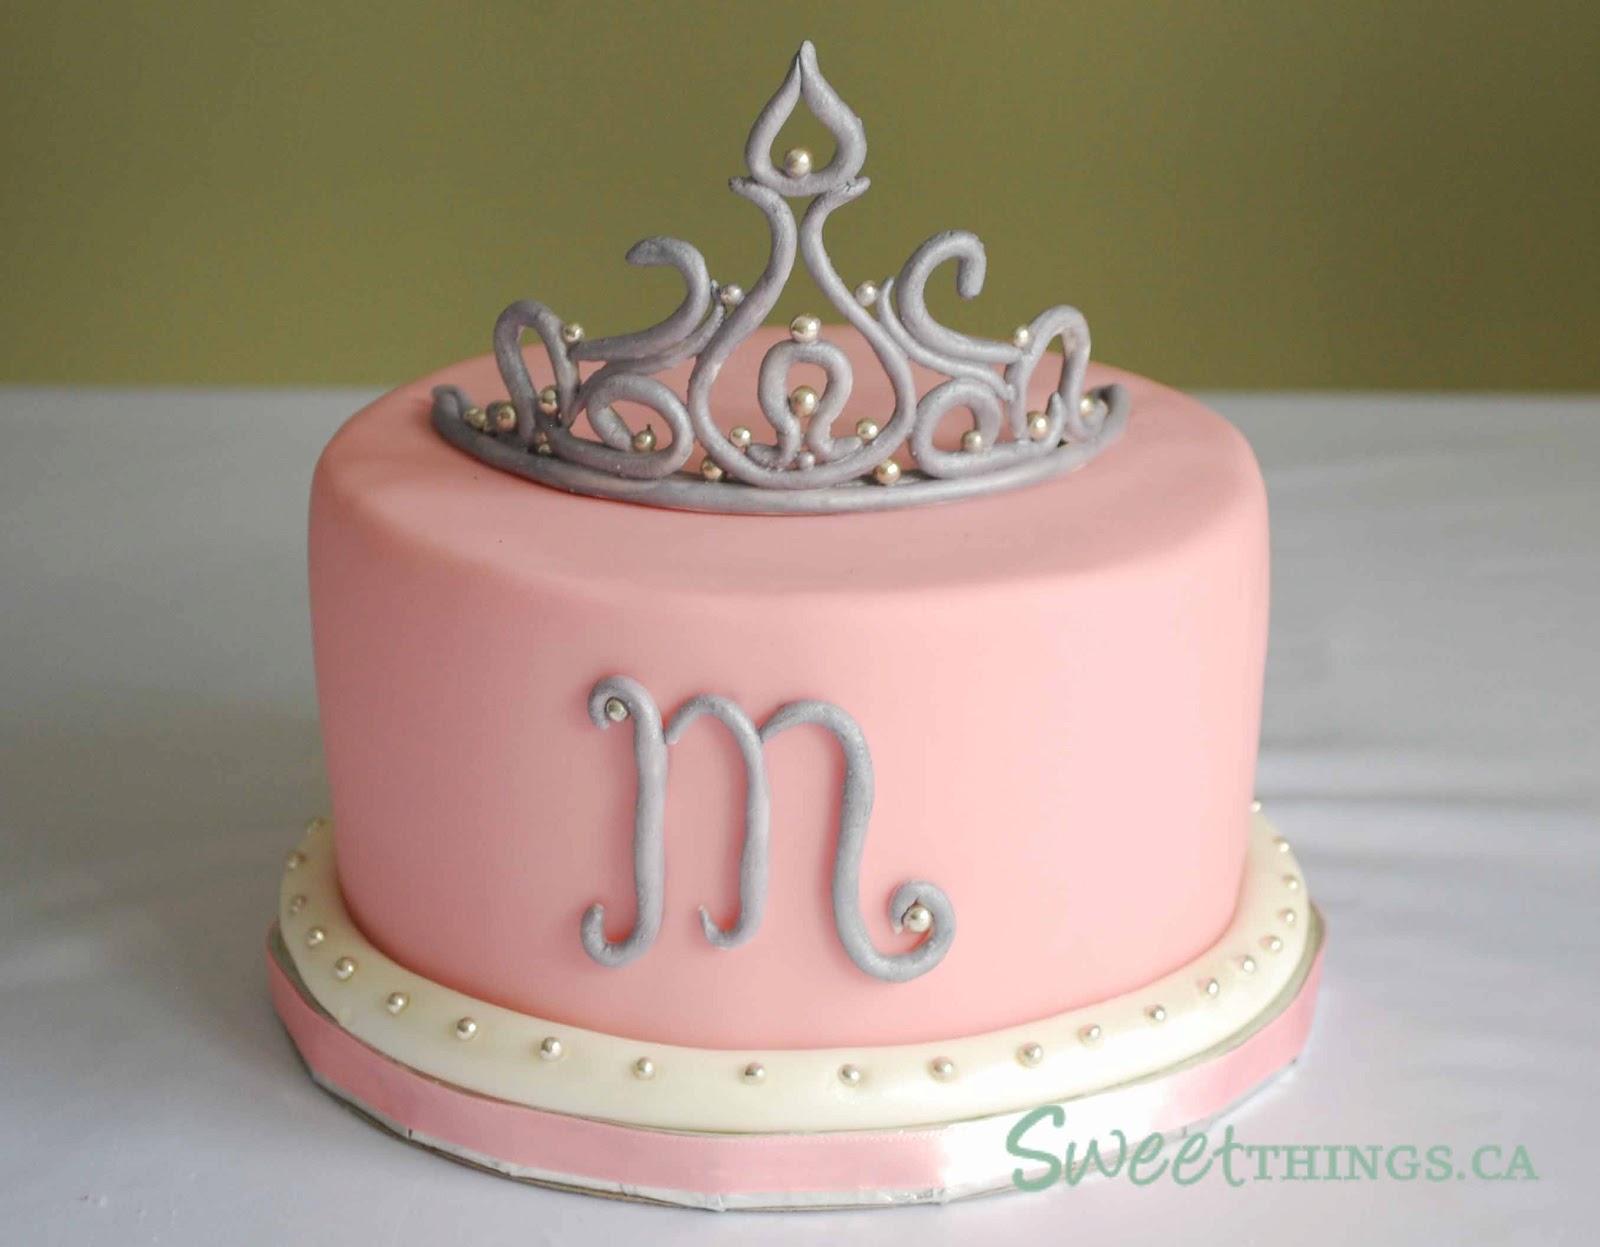 Sweetthings 8th Birthday Tiara Cake